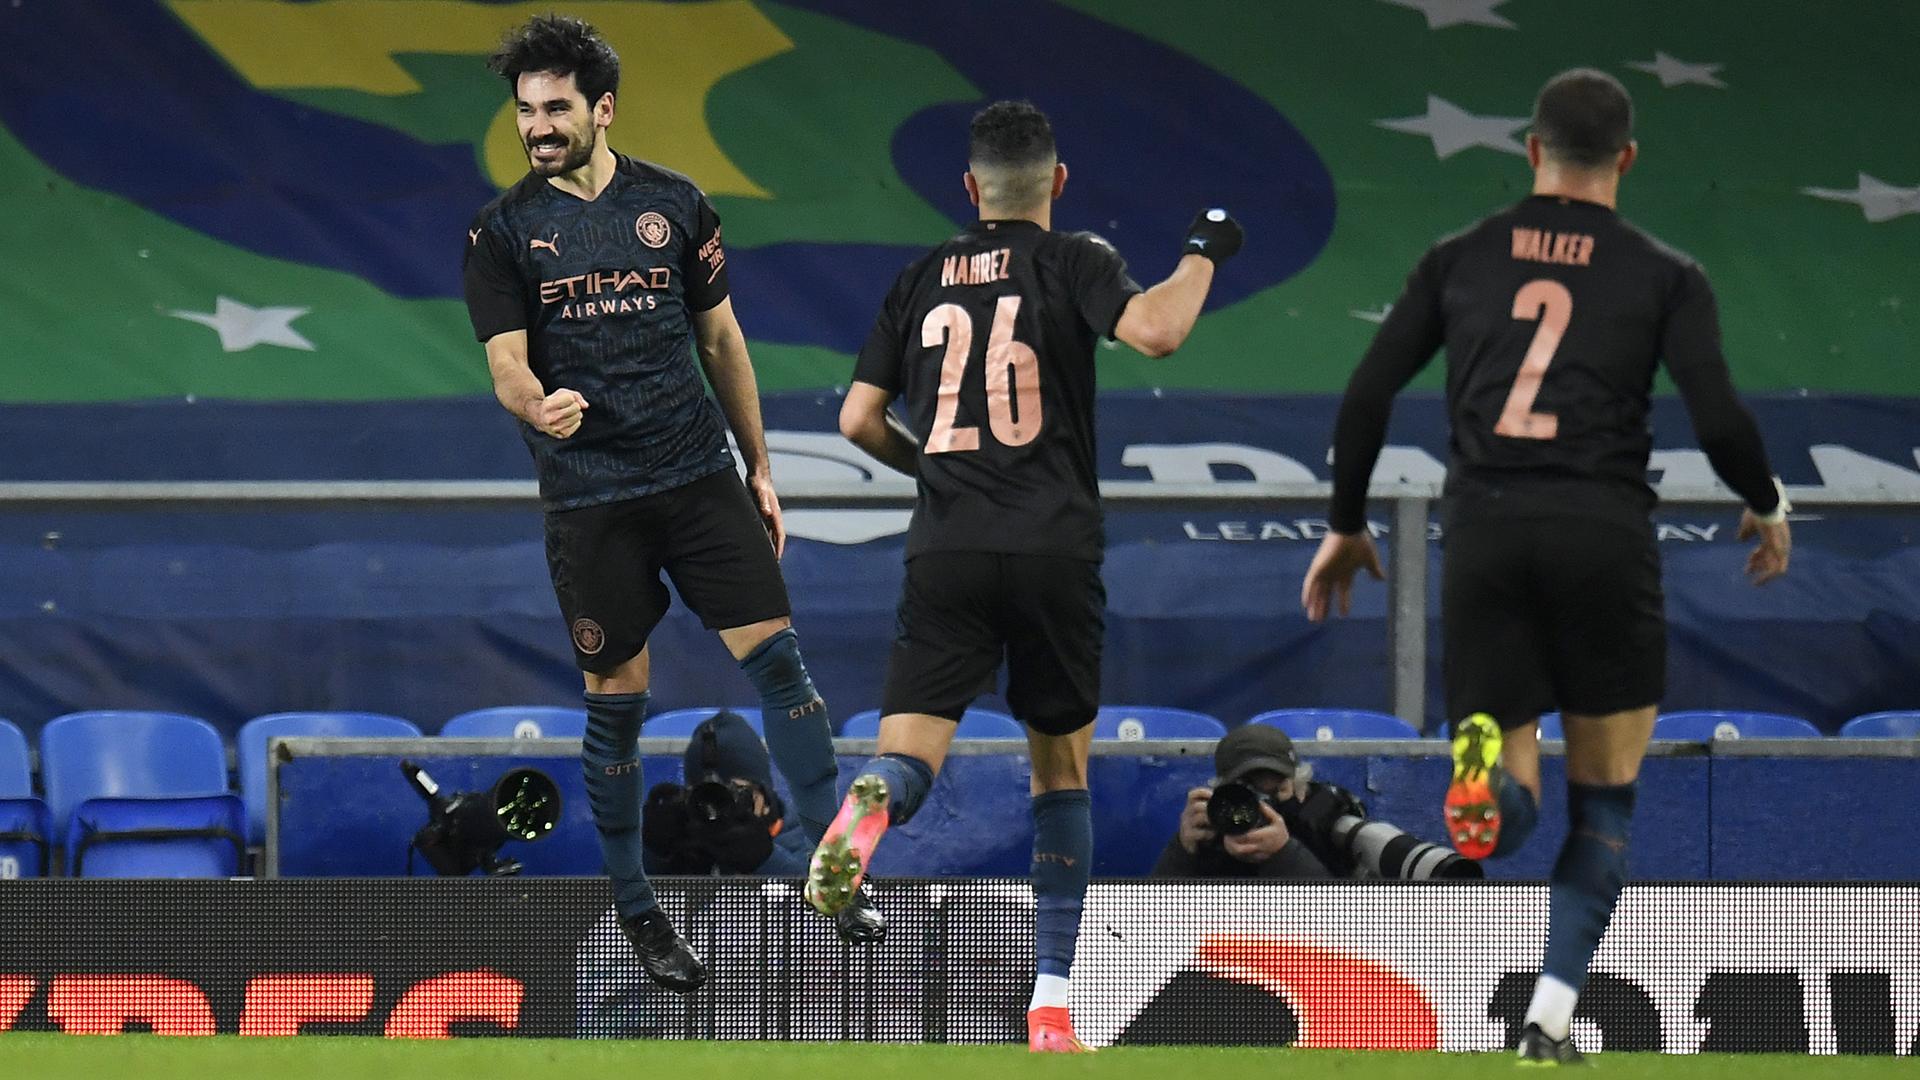 Manchester City's quadruple dream remains intact thanks to Gundogan